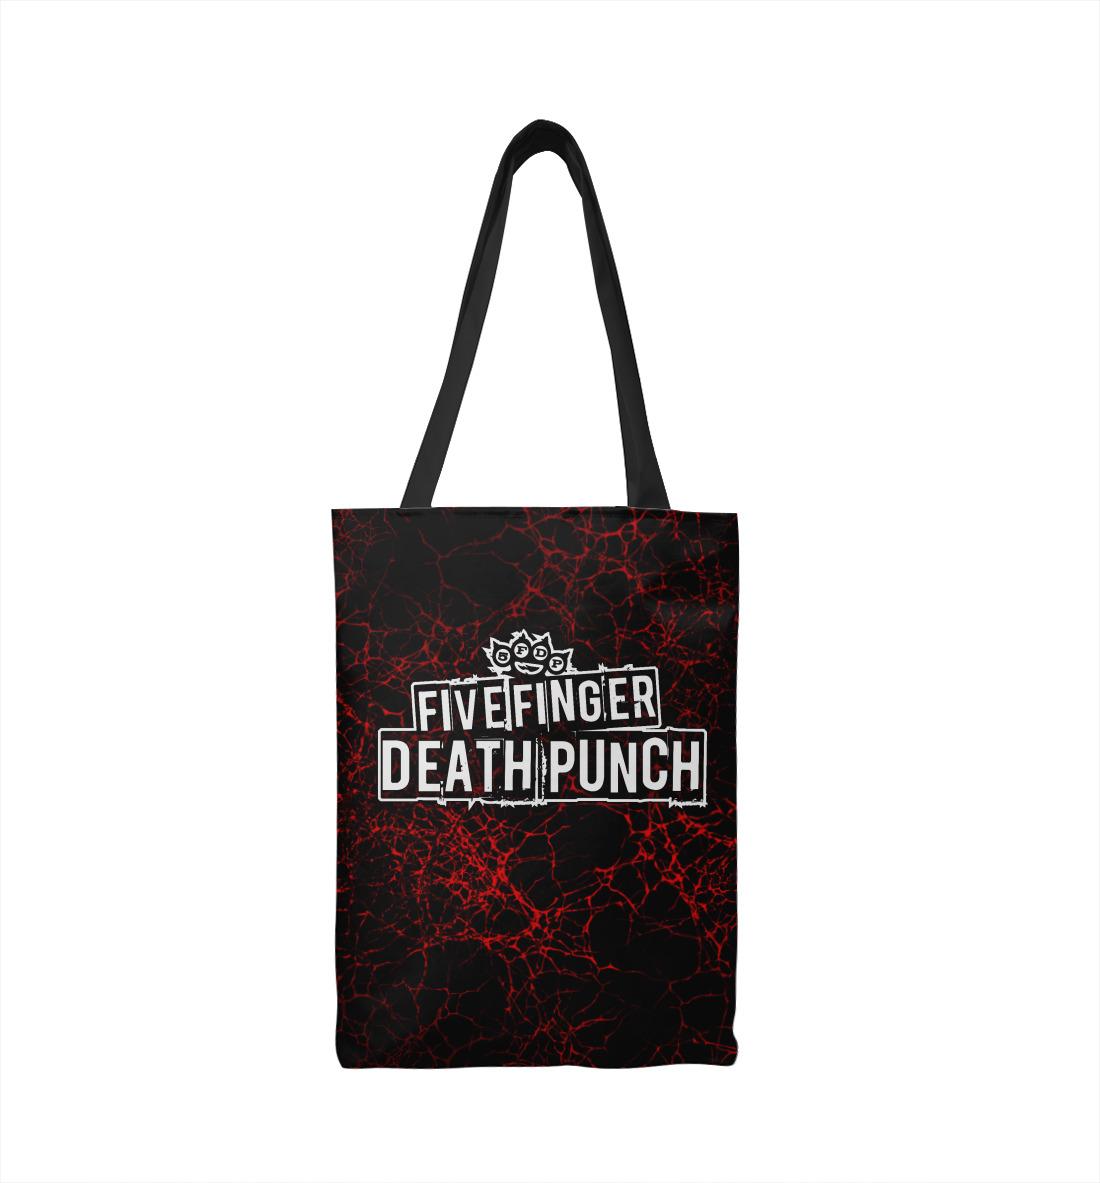 Фото - Five Finger Death Punch five finger death punch got your six